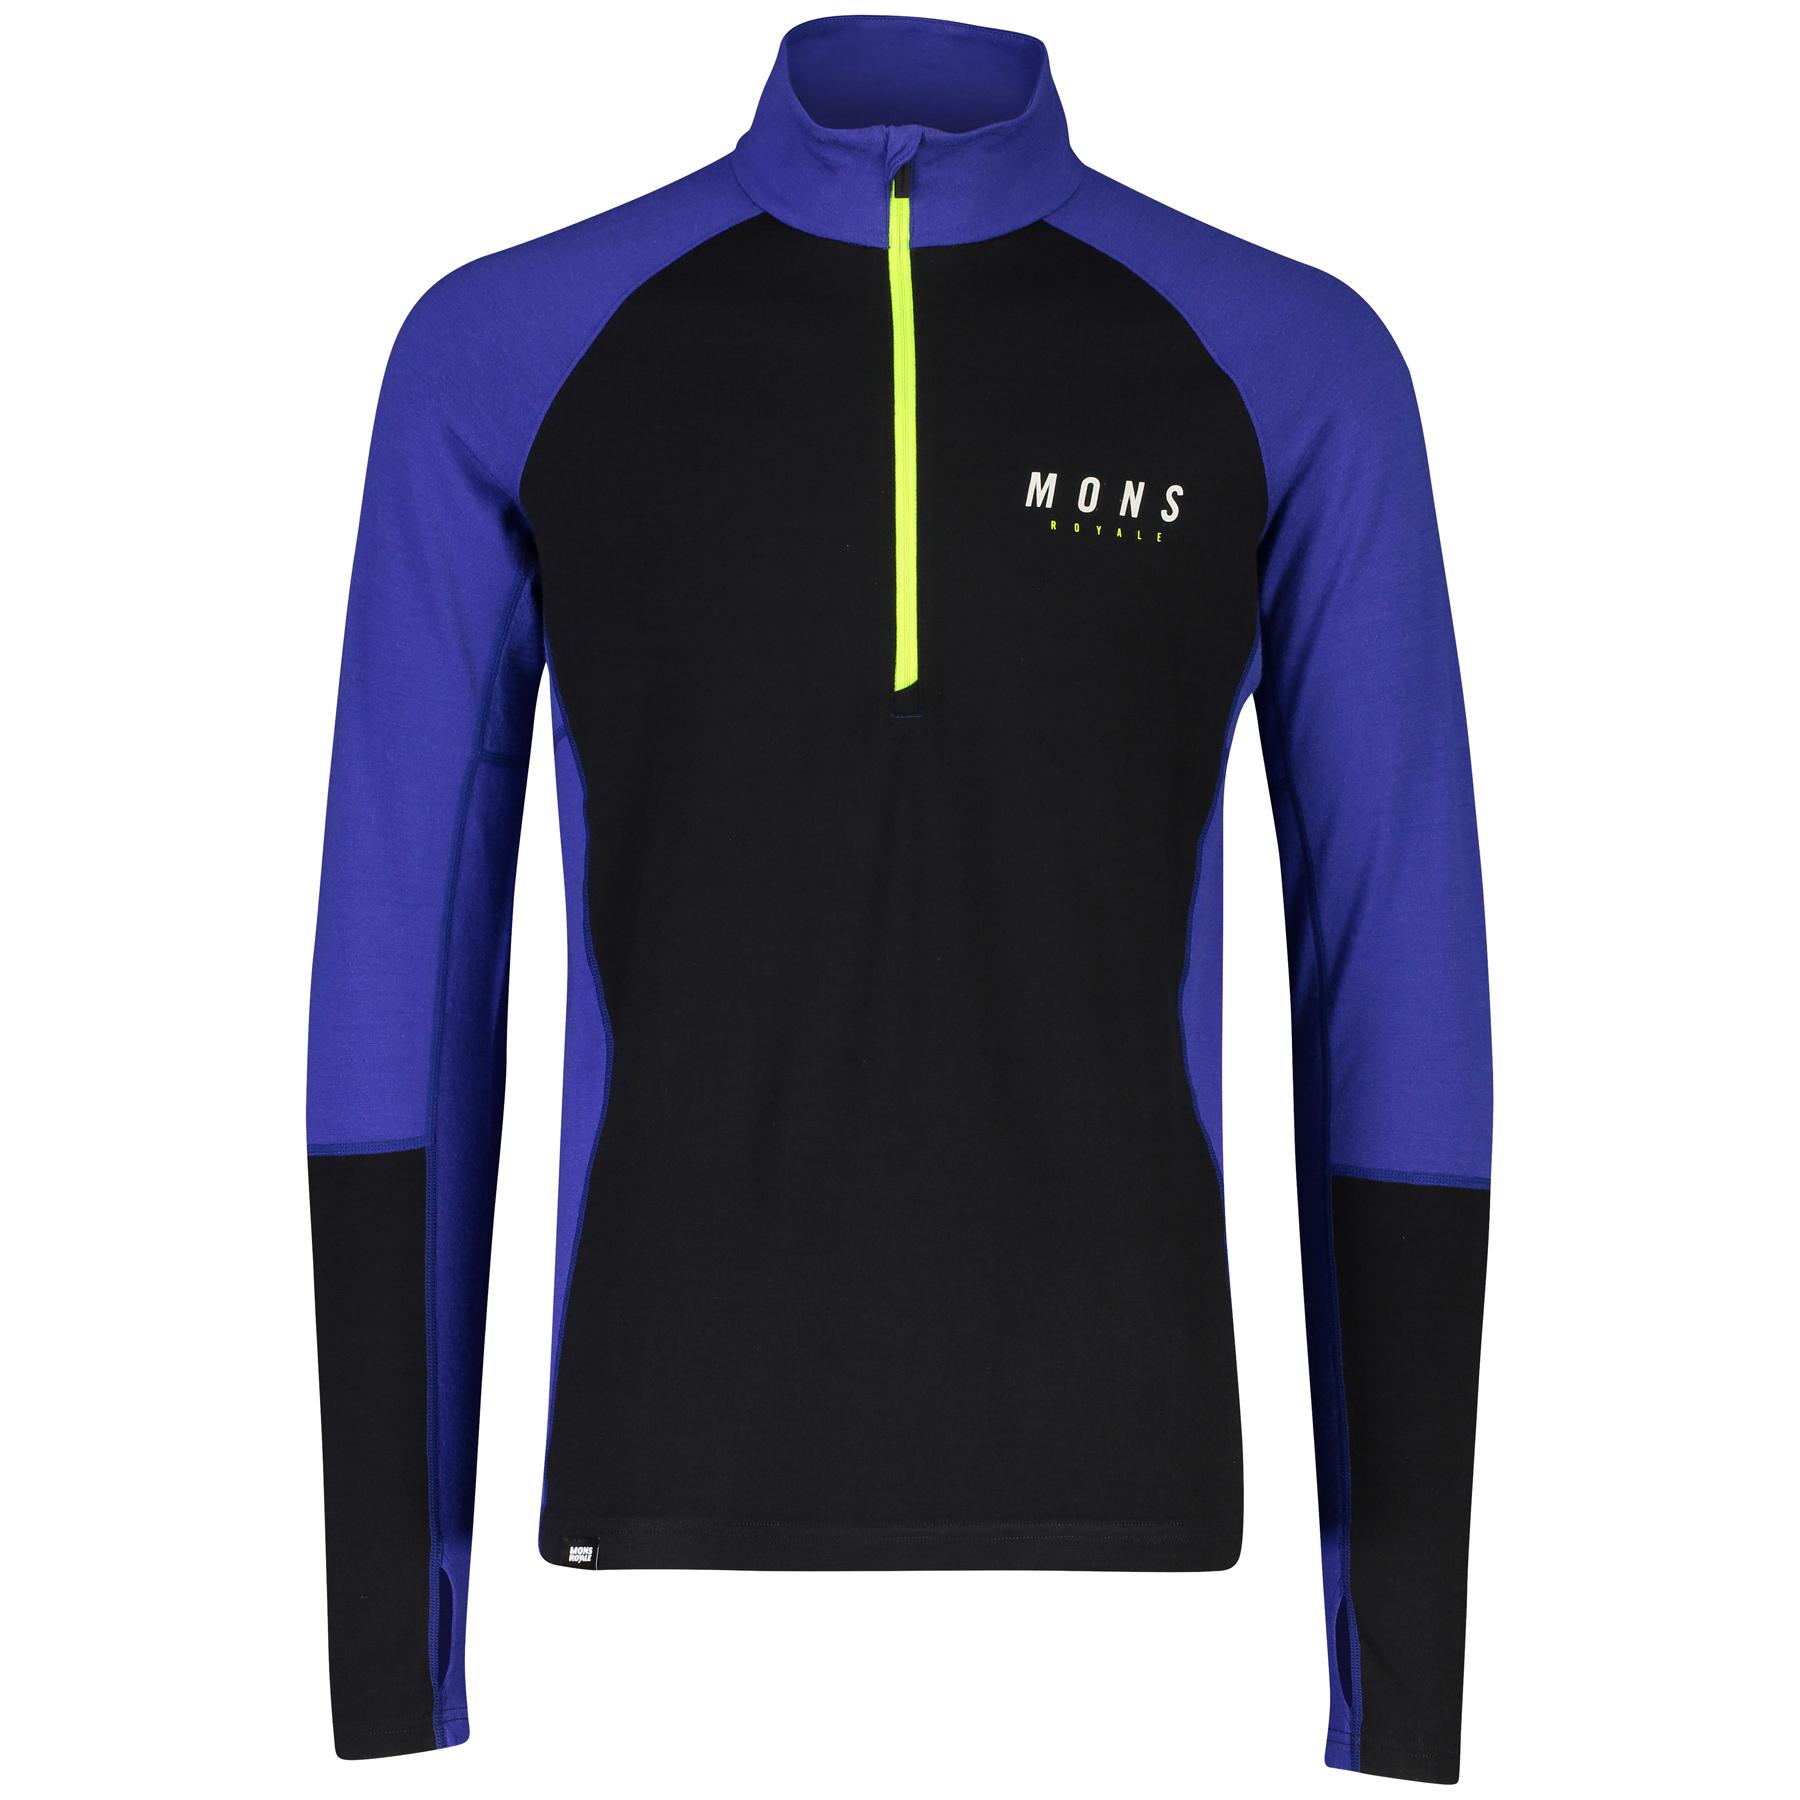 Mons Royale Olympus 3.0 Half Zip Longsleeve Shirt 100387 - ultra blue/black